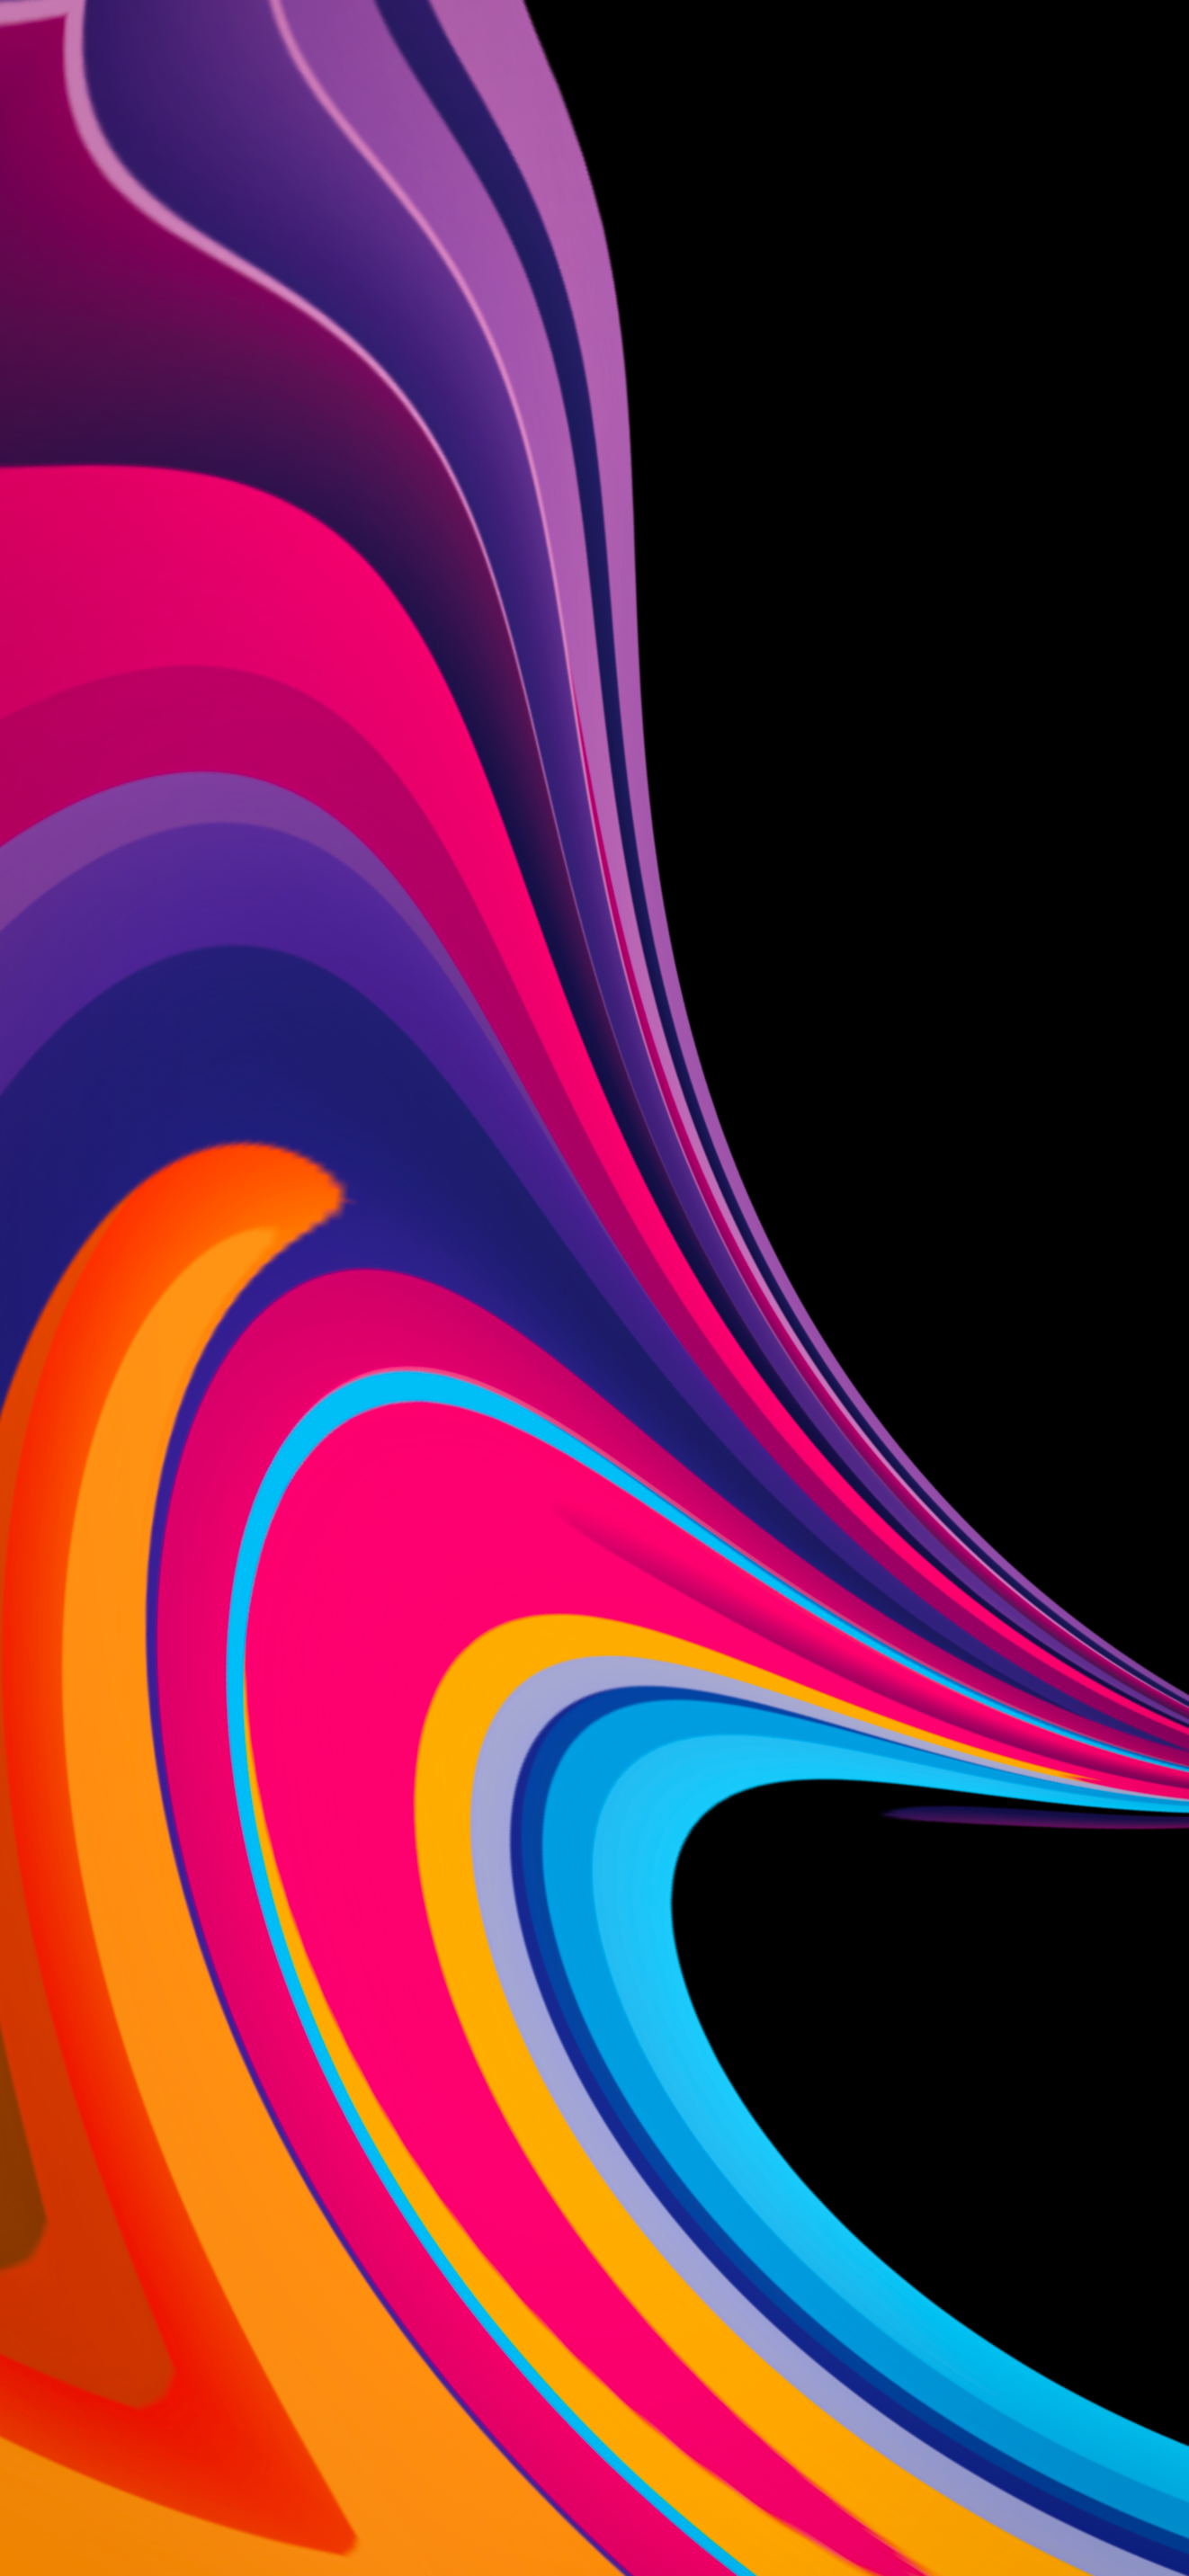 multi color abstract swirl IPHONE X, XR, XS, XS MAX, 1PLUS 6T - V109 - JFL